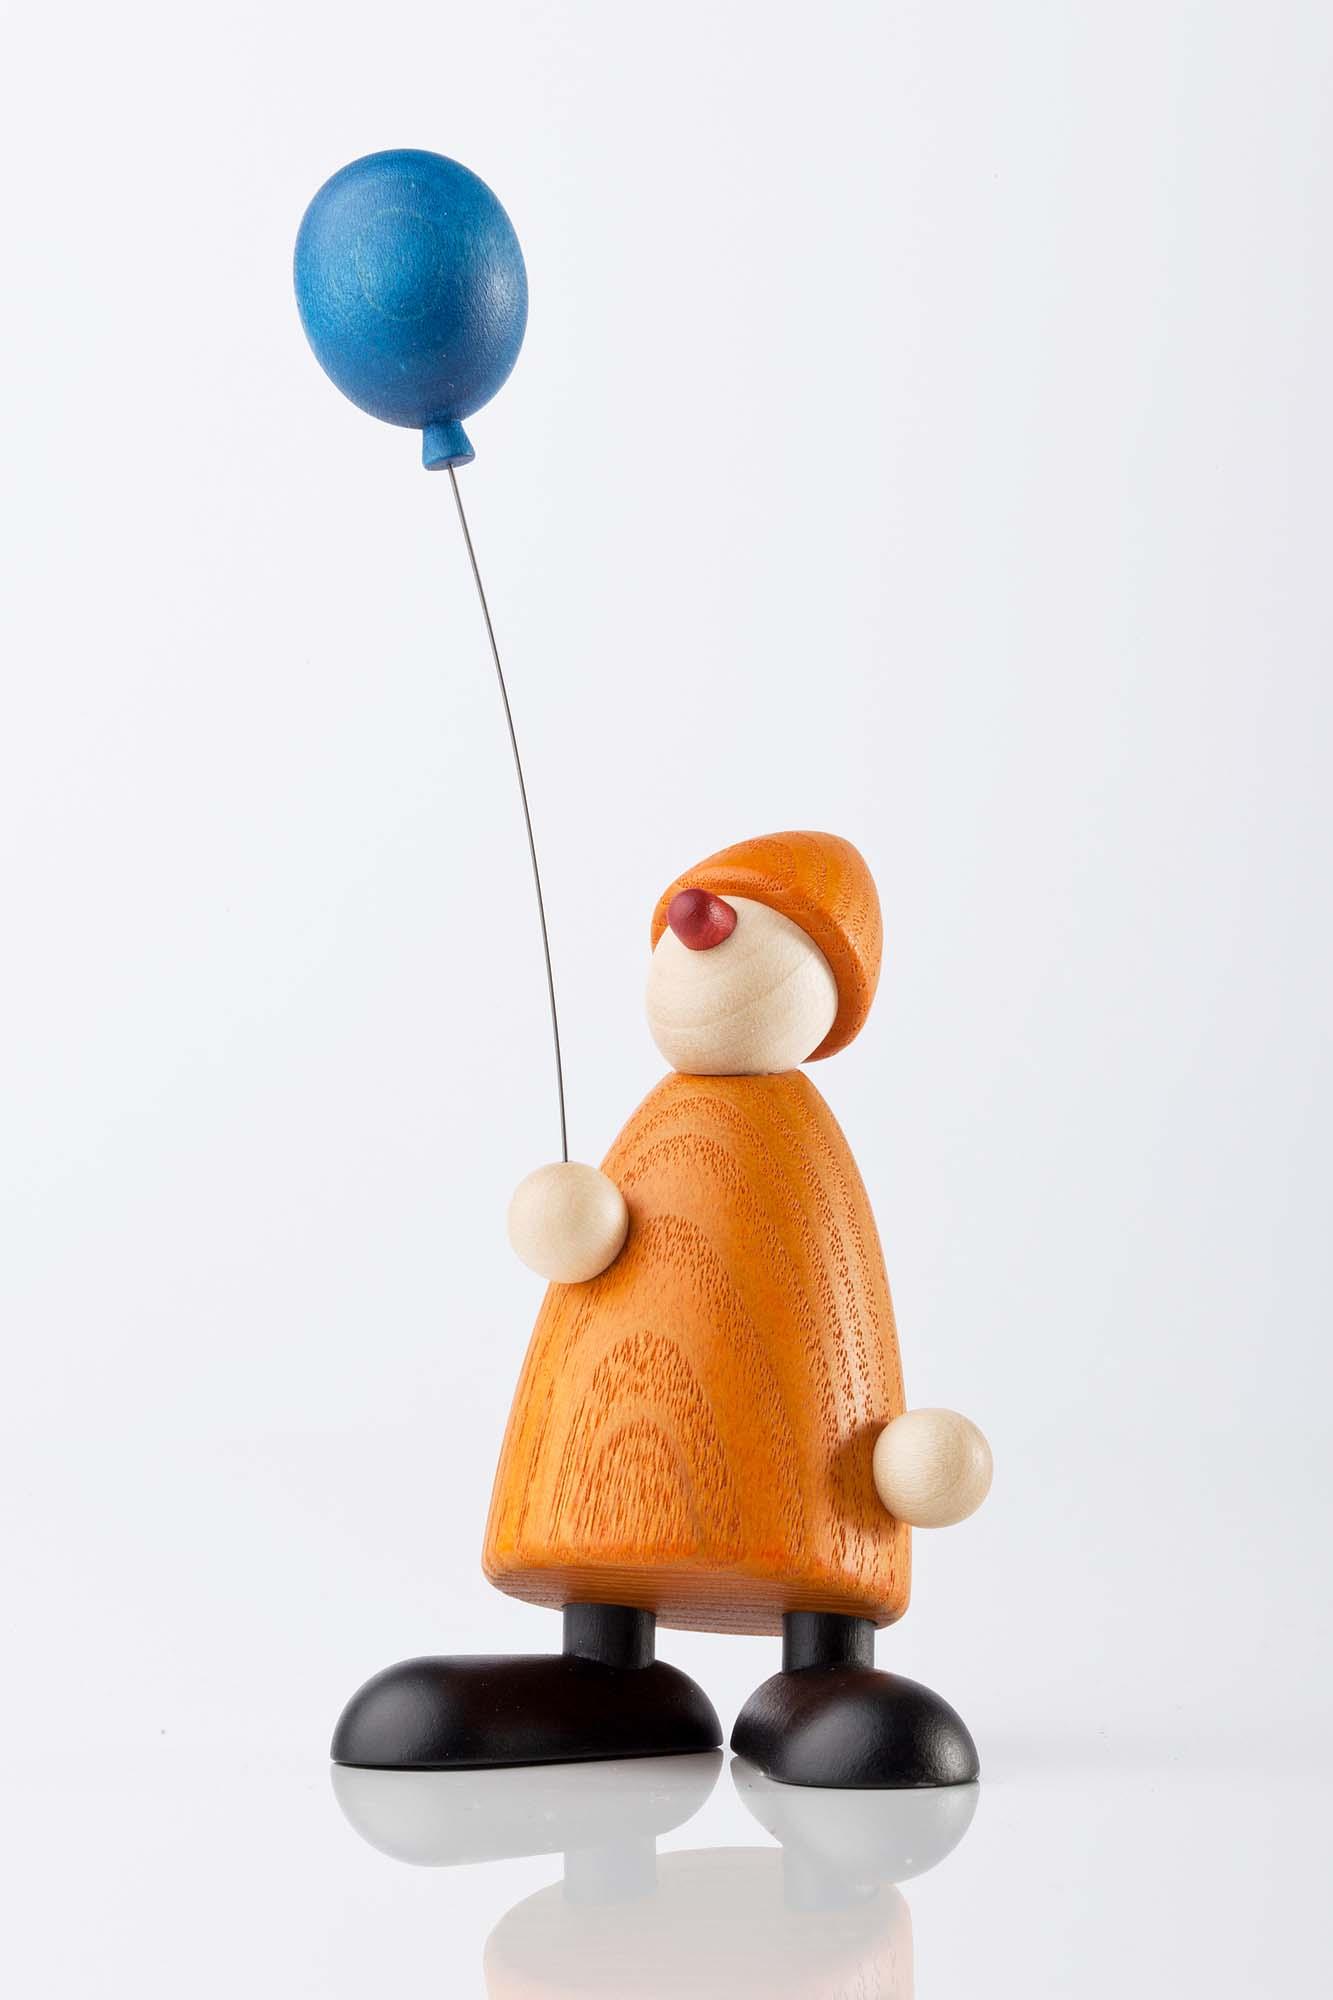 Gratulant Linus mit blauem Luftballon 5011